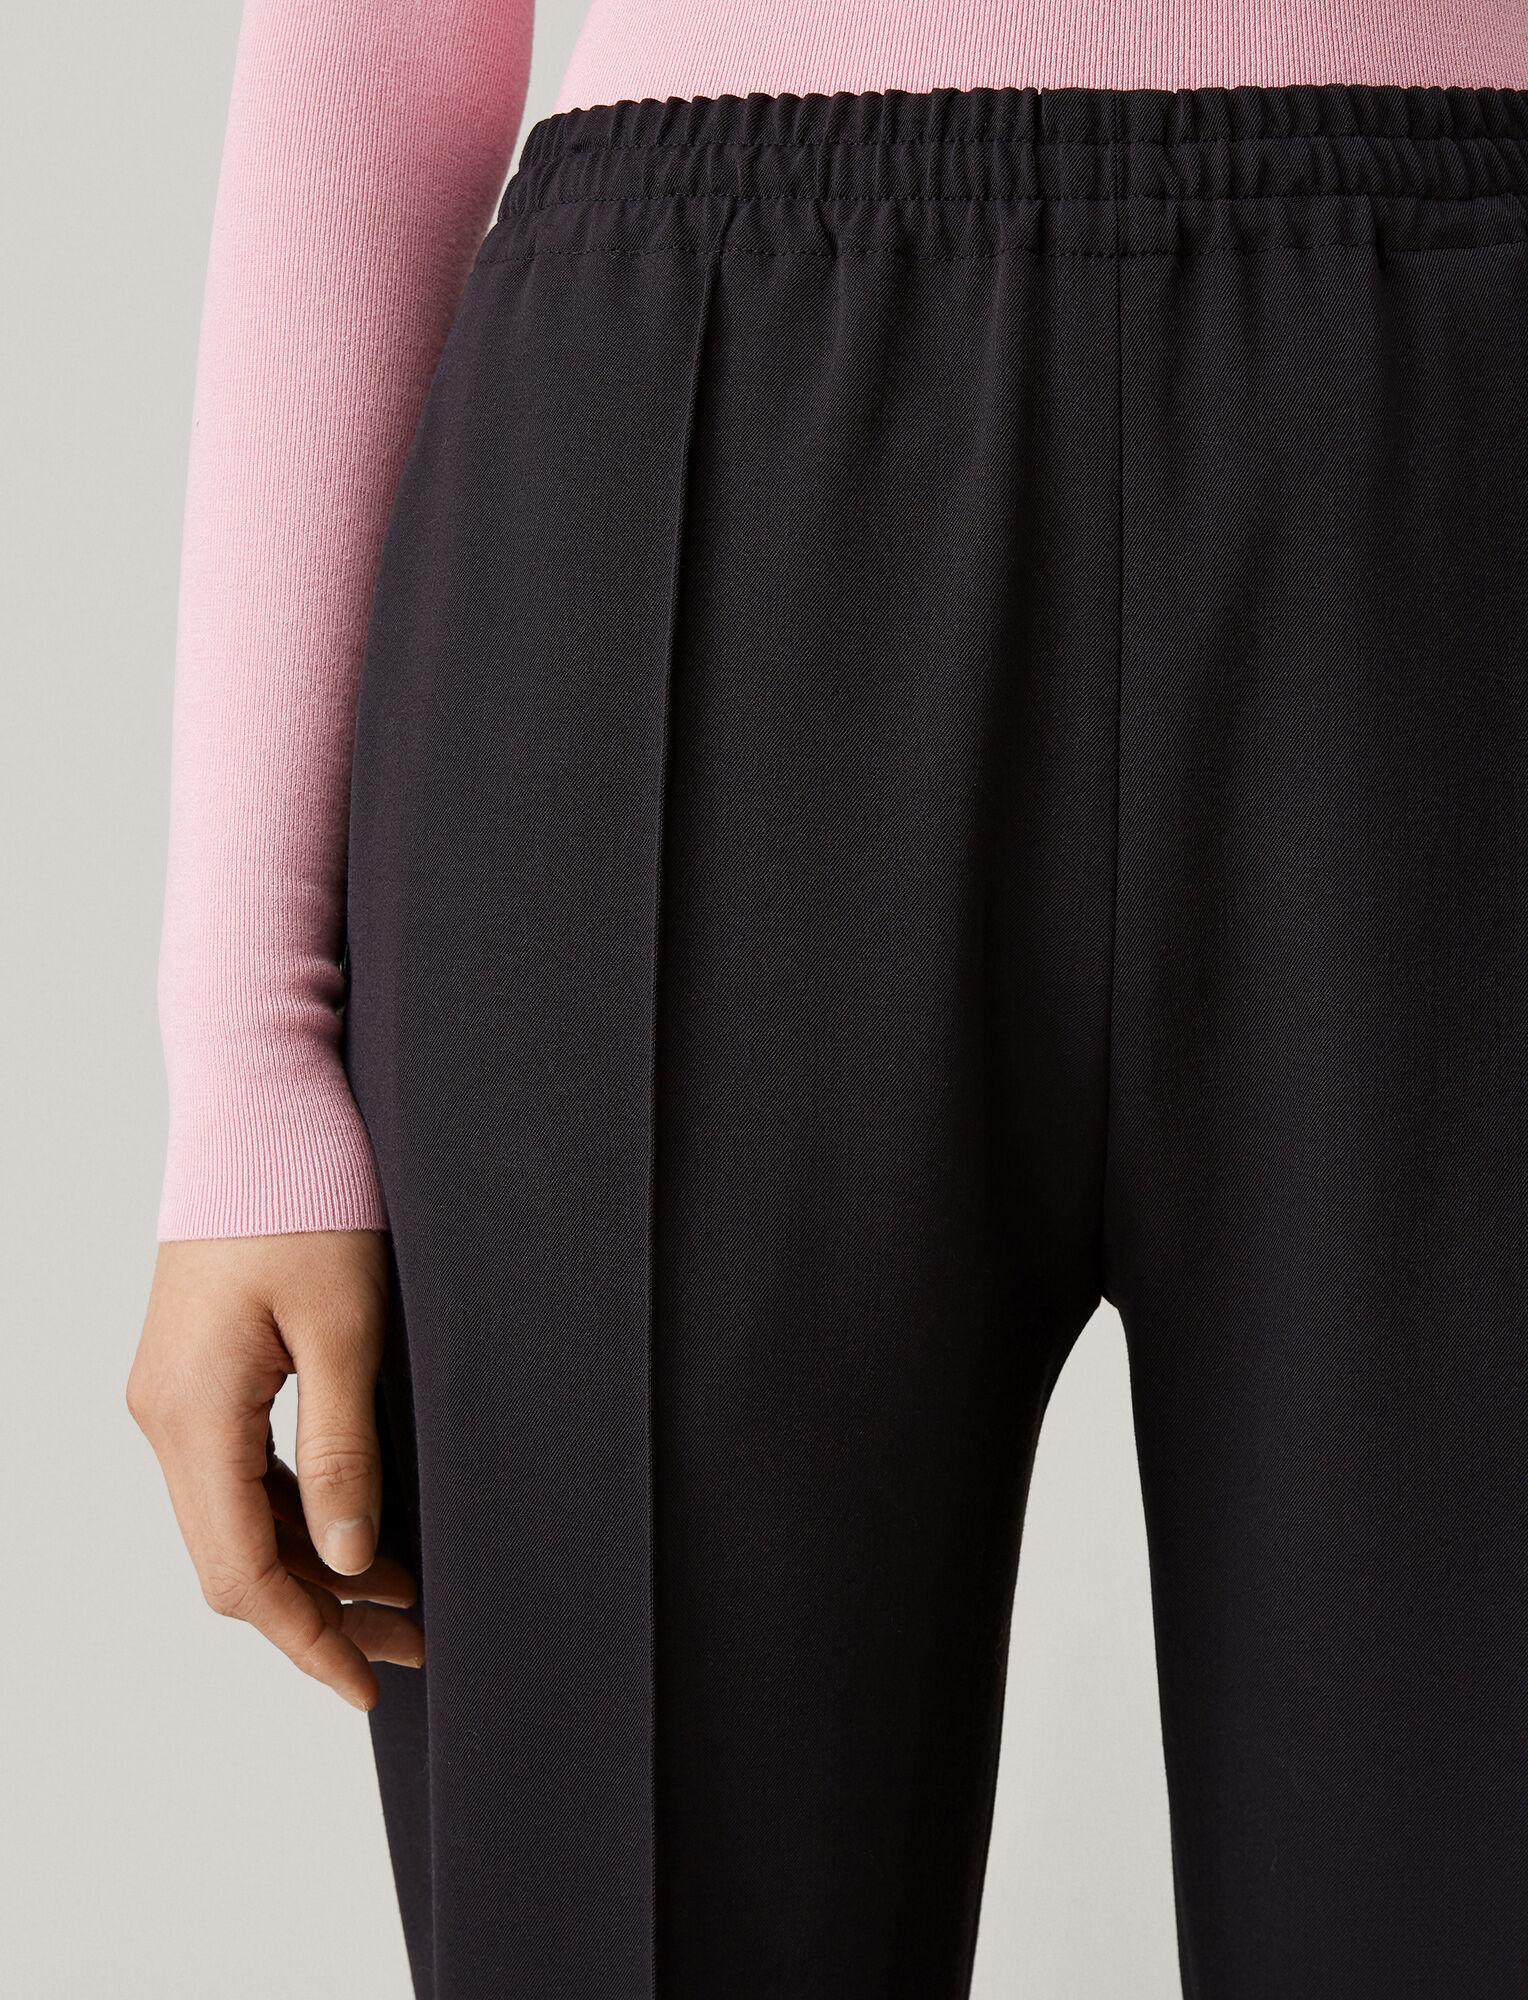 Joseph, Dalton Comfort Wool Trousers, in NAVY